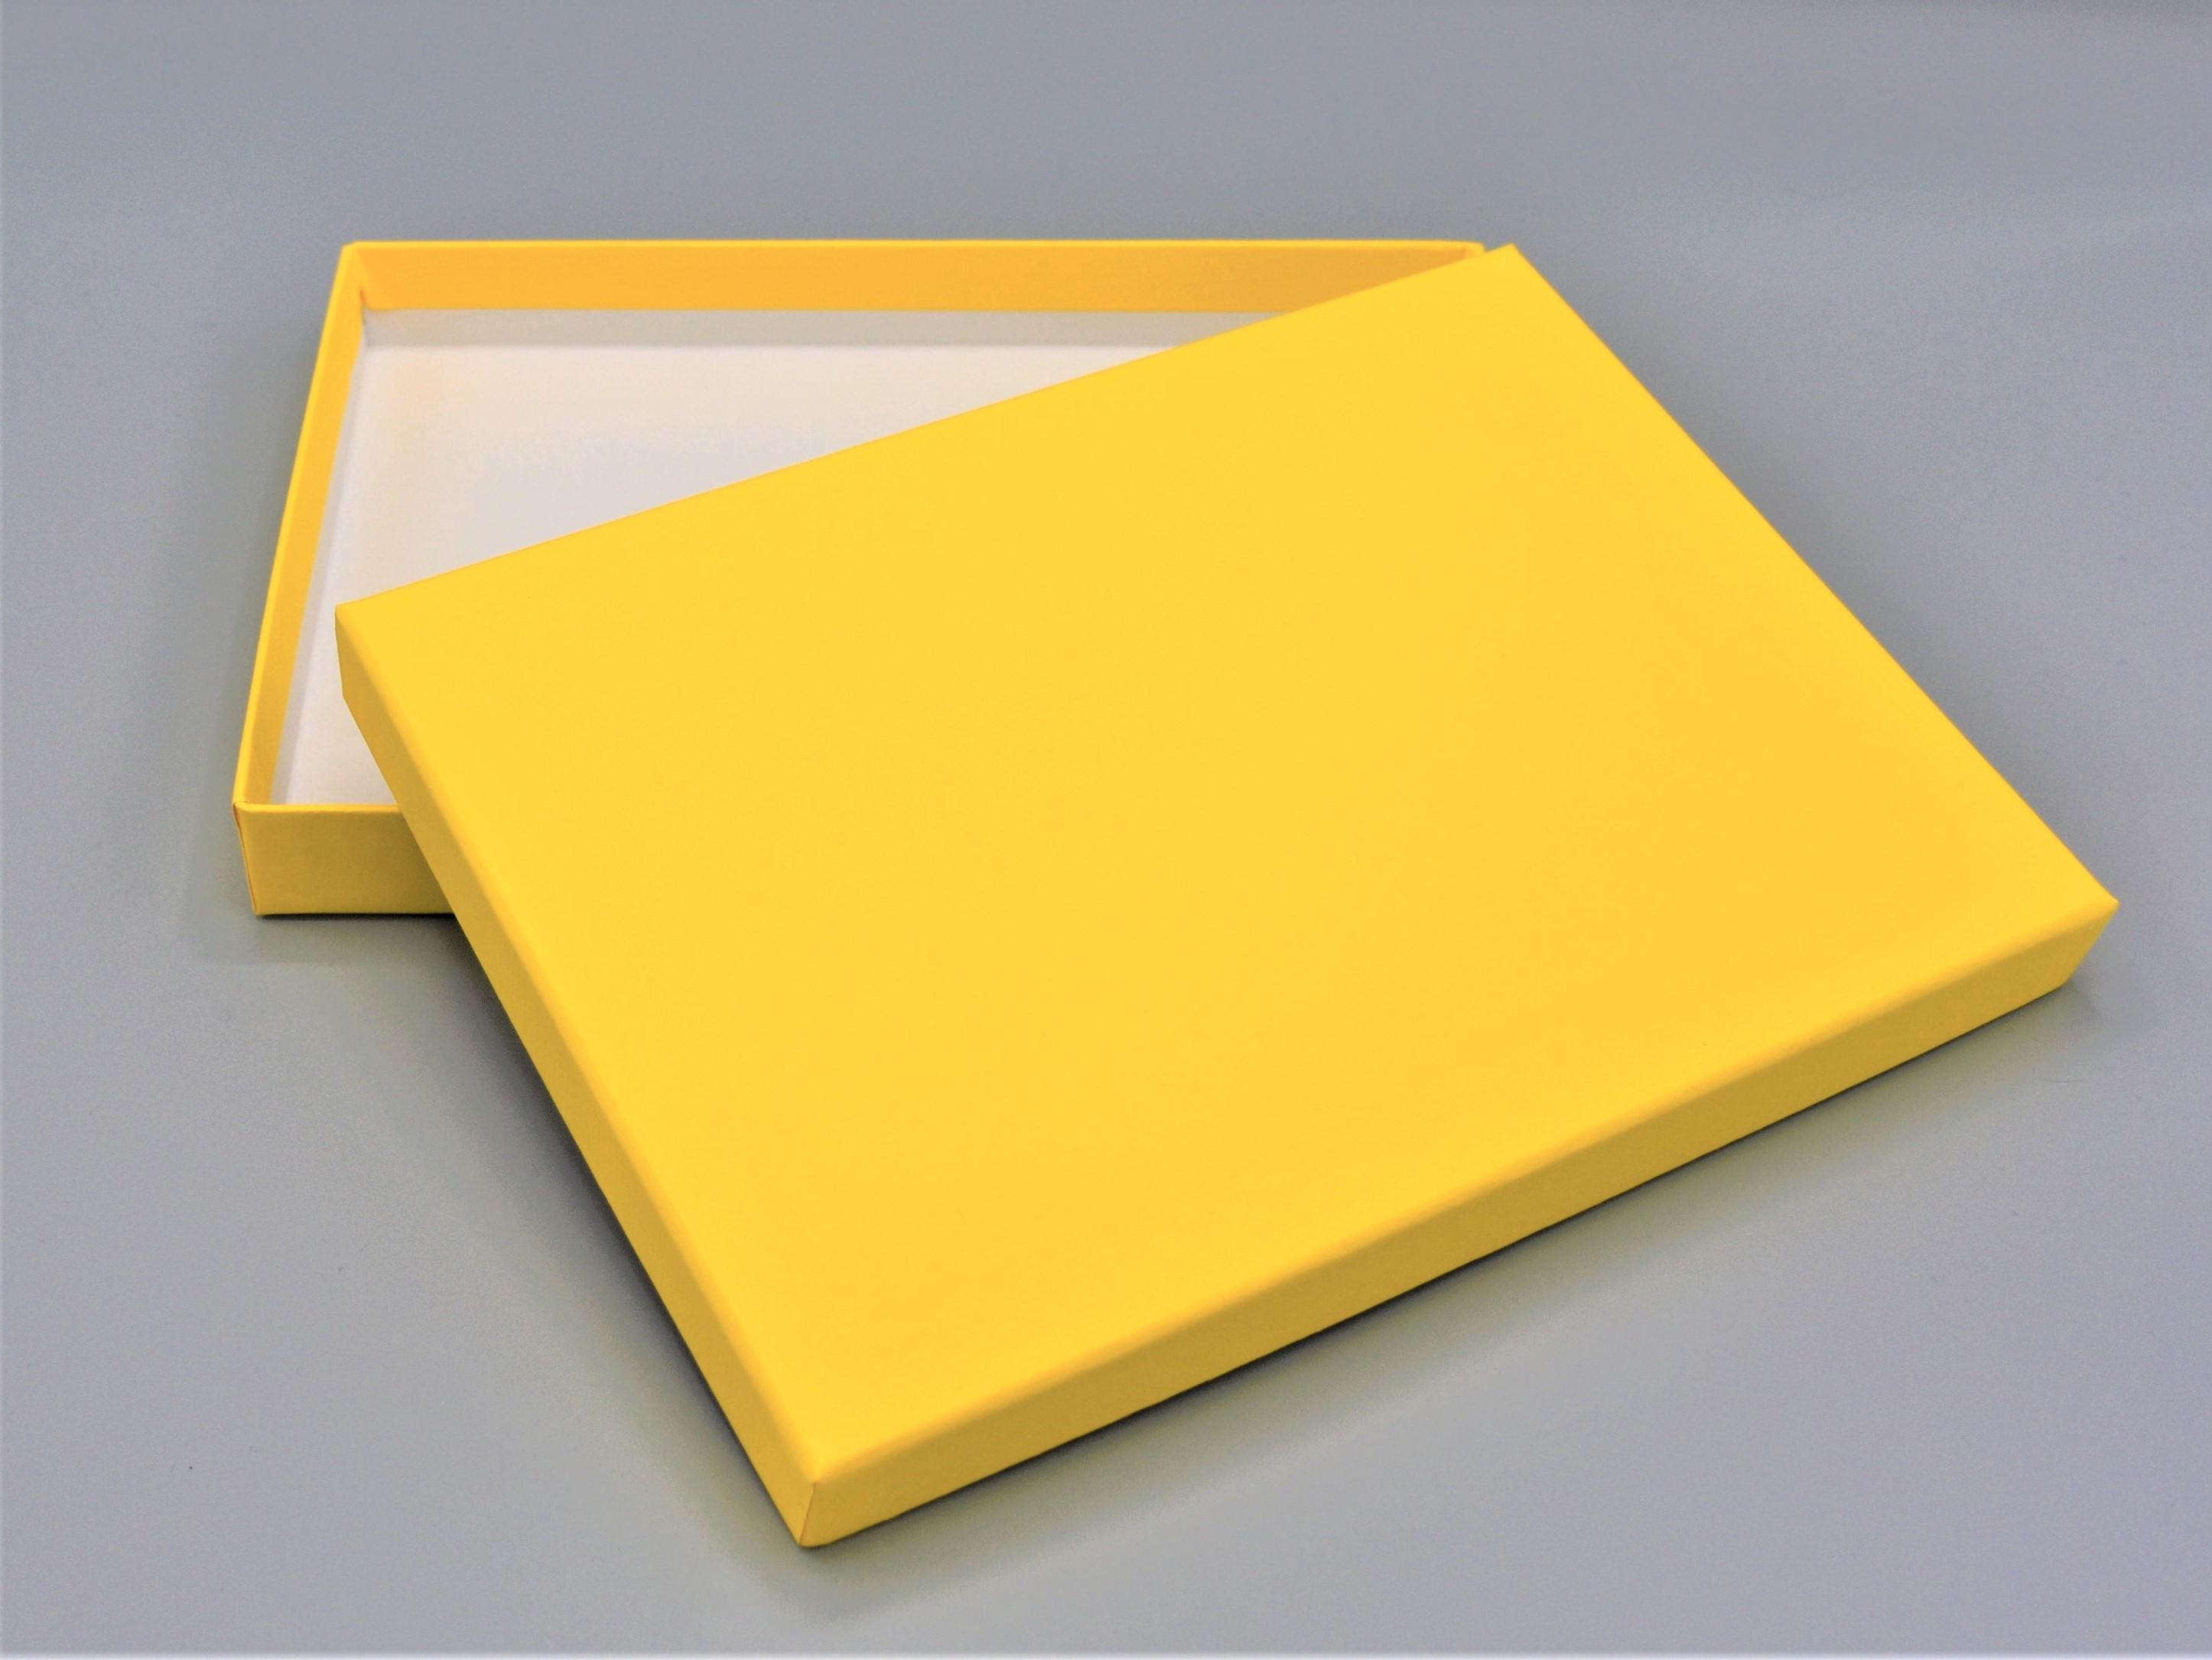 artoz-pure-box-A5_sonnen-gelb_grusskarten-design44VRJS00qoi05A64J3kE5TRlI8q